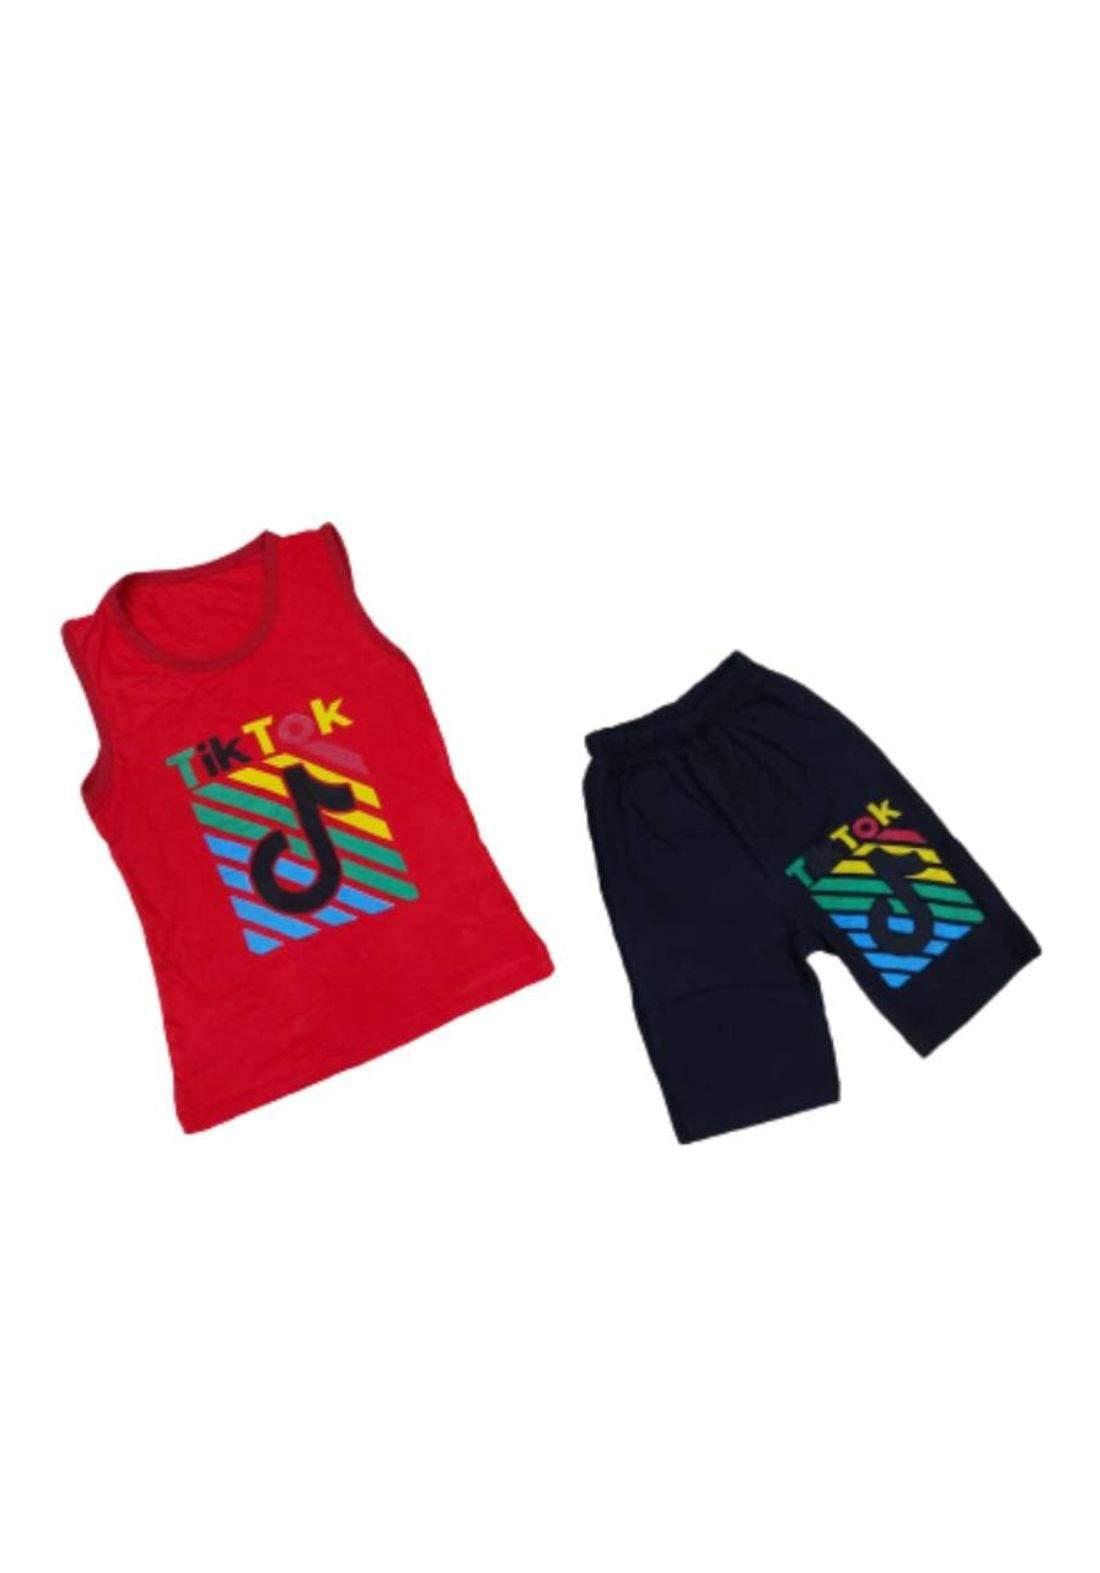 tracksuit for boys red  (shirt +short) ( تراكسوت ولادي احمر (برموده وكيمونه